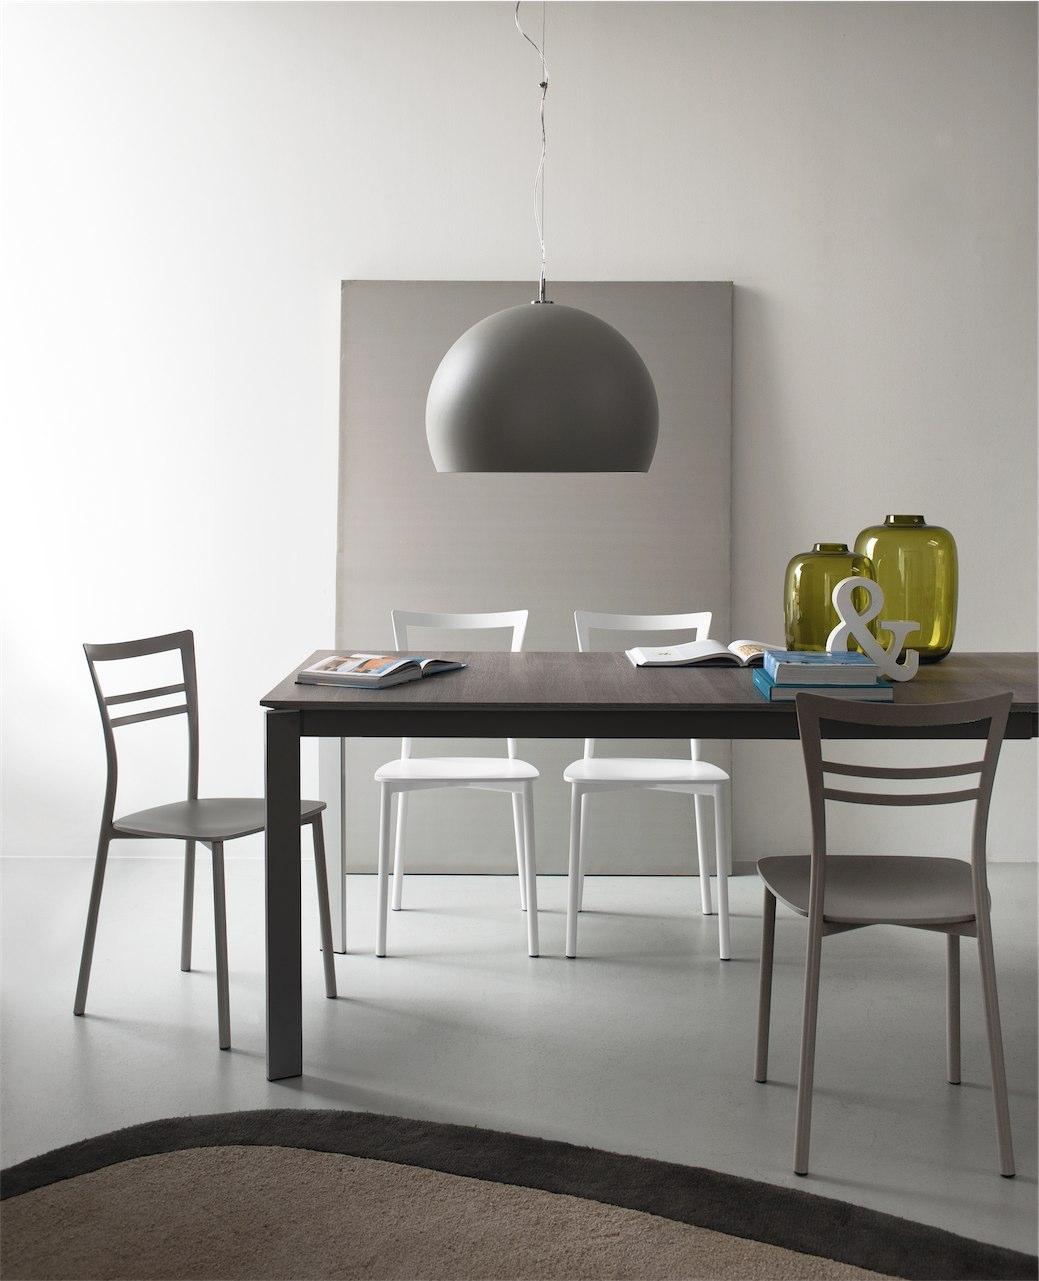 sedia go connubia by calligaris linea tavoli e sedie. Black Bedroom Furniture Sets. Home Design Ideas